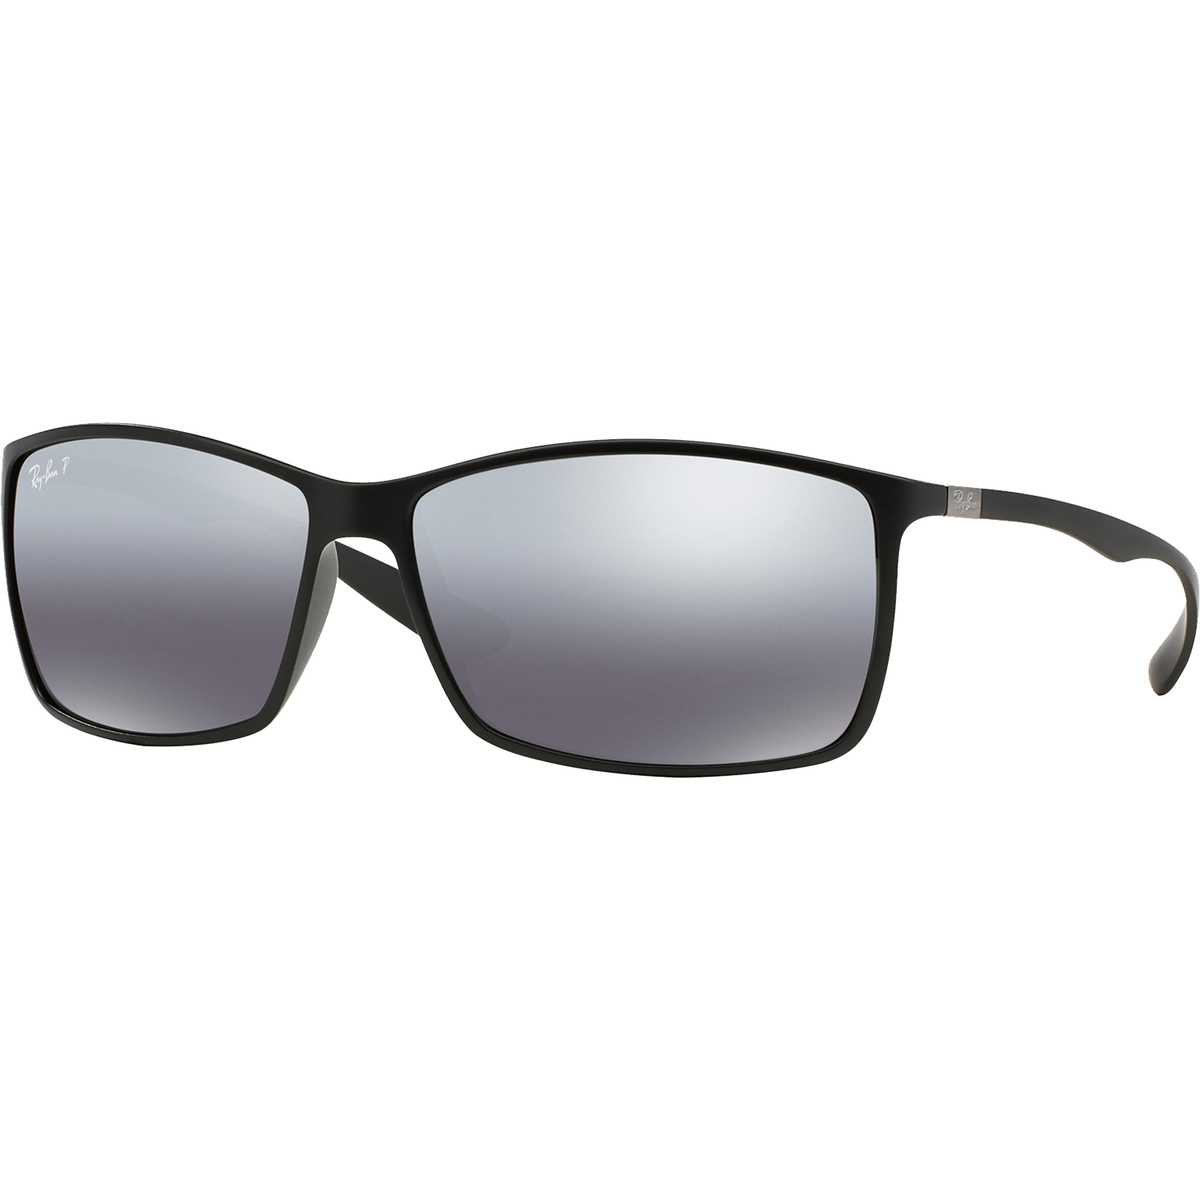 f6e033c914c41 Ray-Ban Polarized Liteforce Sunglasses - Black Silver Mirror   0RB4179601S8262